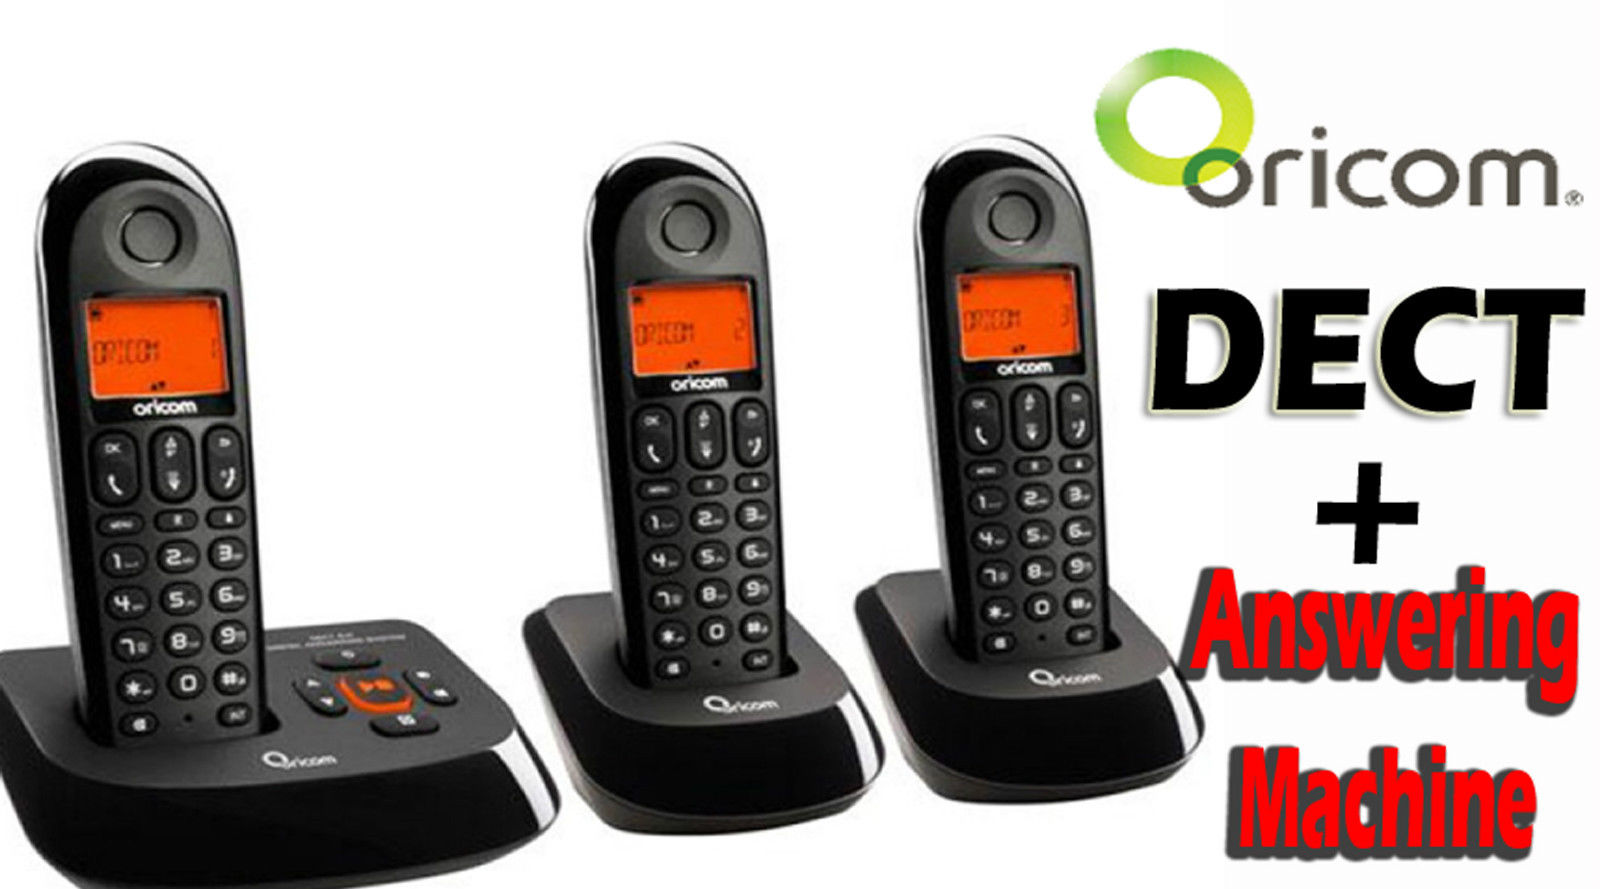 ORICOM ECO710-3 Digital Cordless Telephone SYSTEM 3 handsets